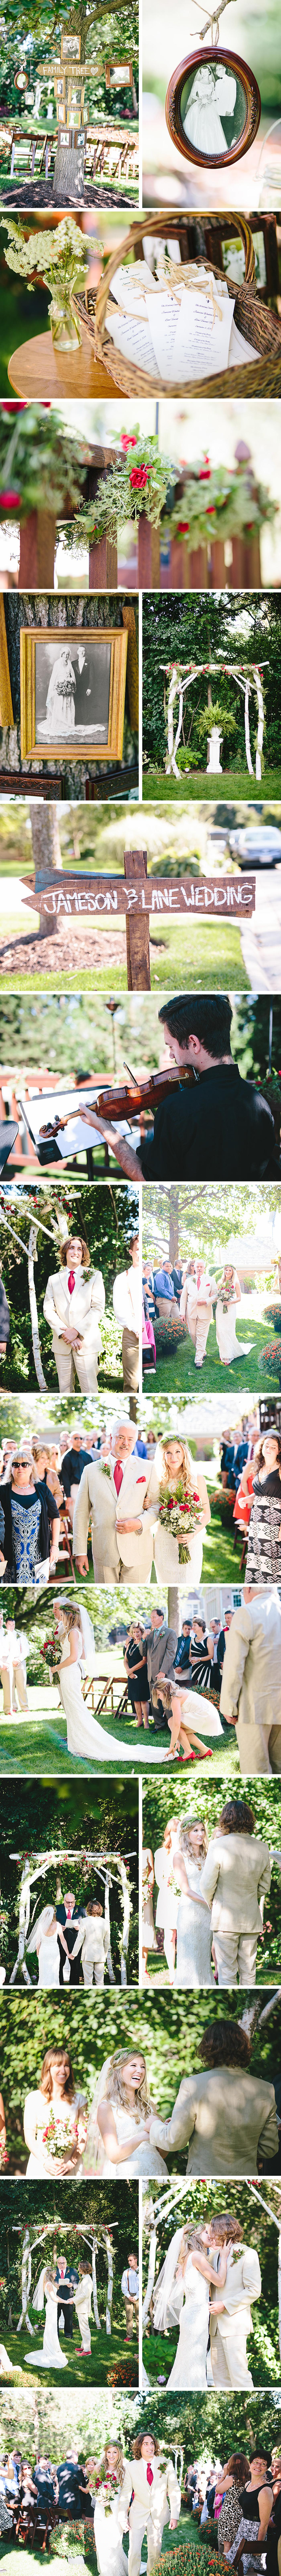 Chicago_Fine_Art_Wedding_Photography_nenn2.jpg